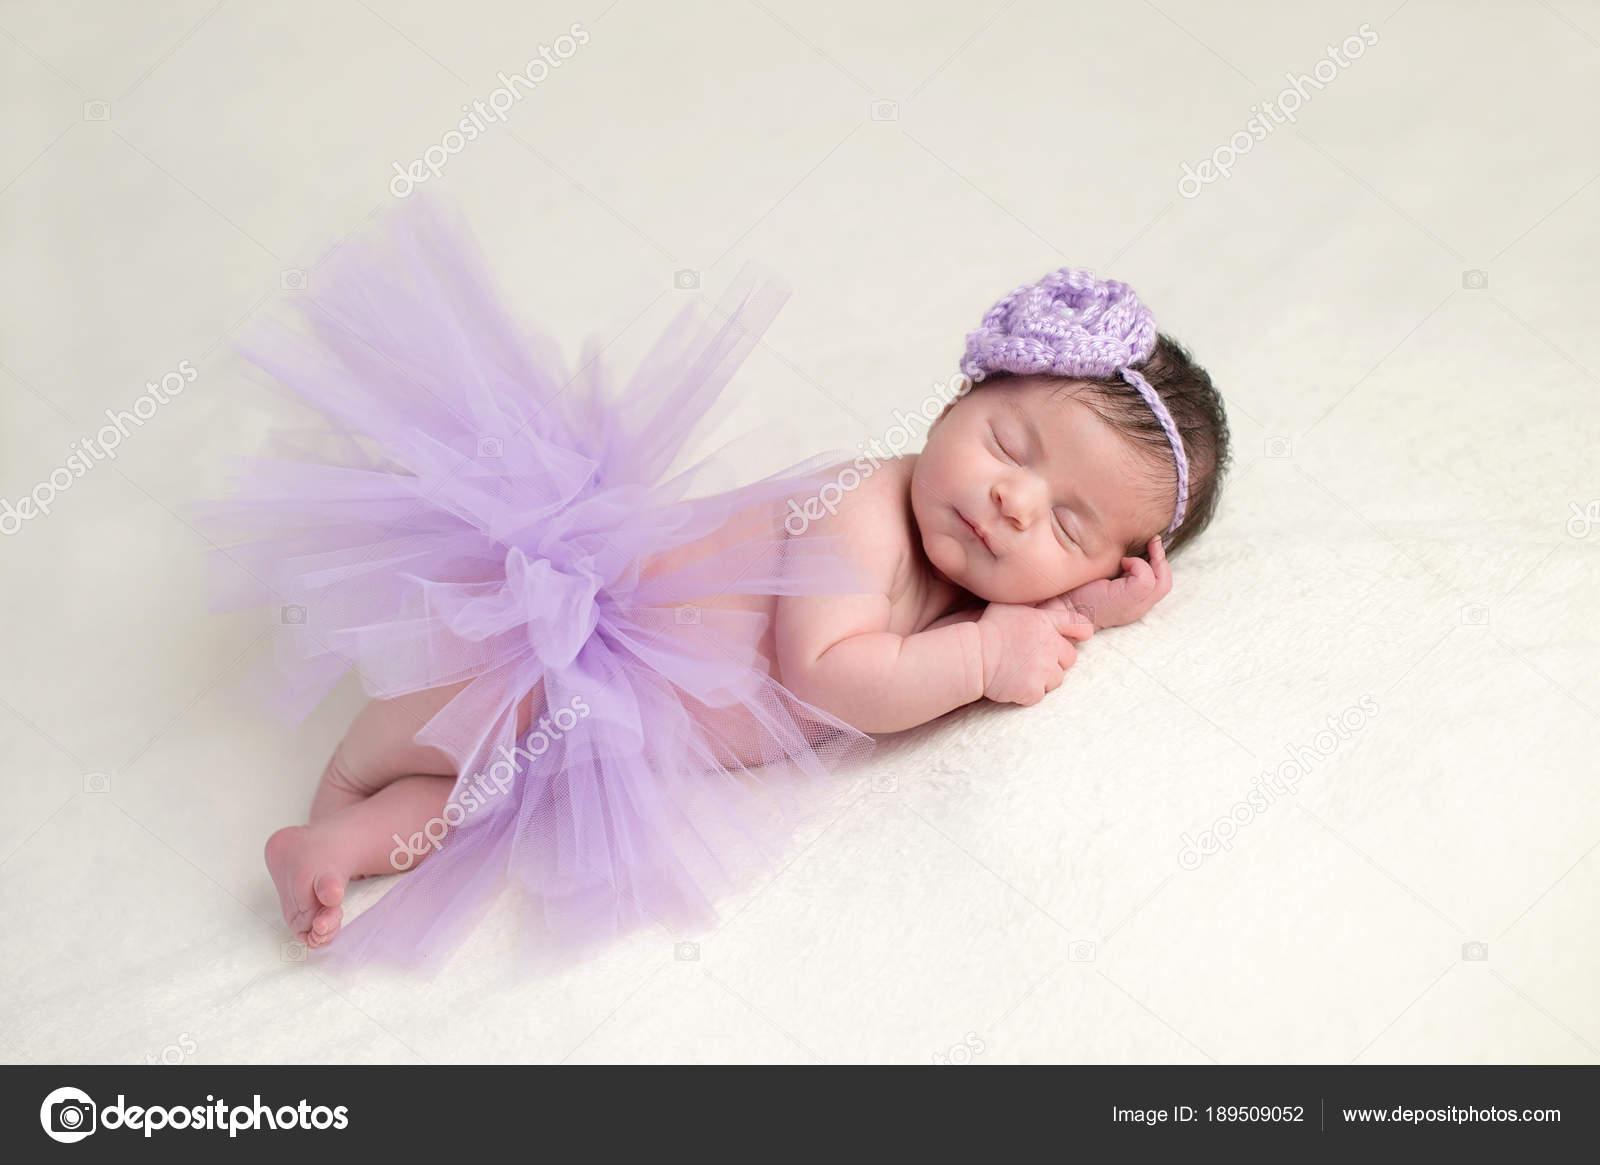 Newborn Baby Girl in Ballerina Costume u2014 Stock Photo  sc 1 st  Depositphotos & Newborn Baby Girl in Ballerina Costume u2014 Stock Photo © katrinaelena ...